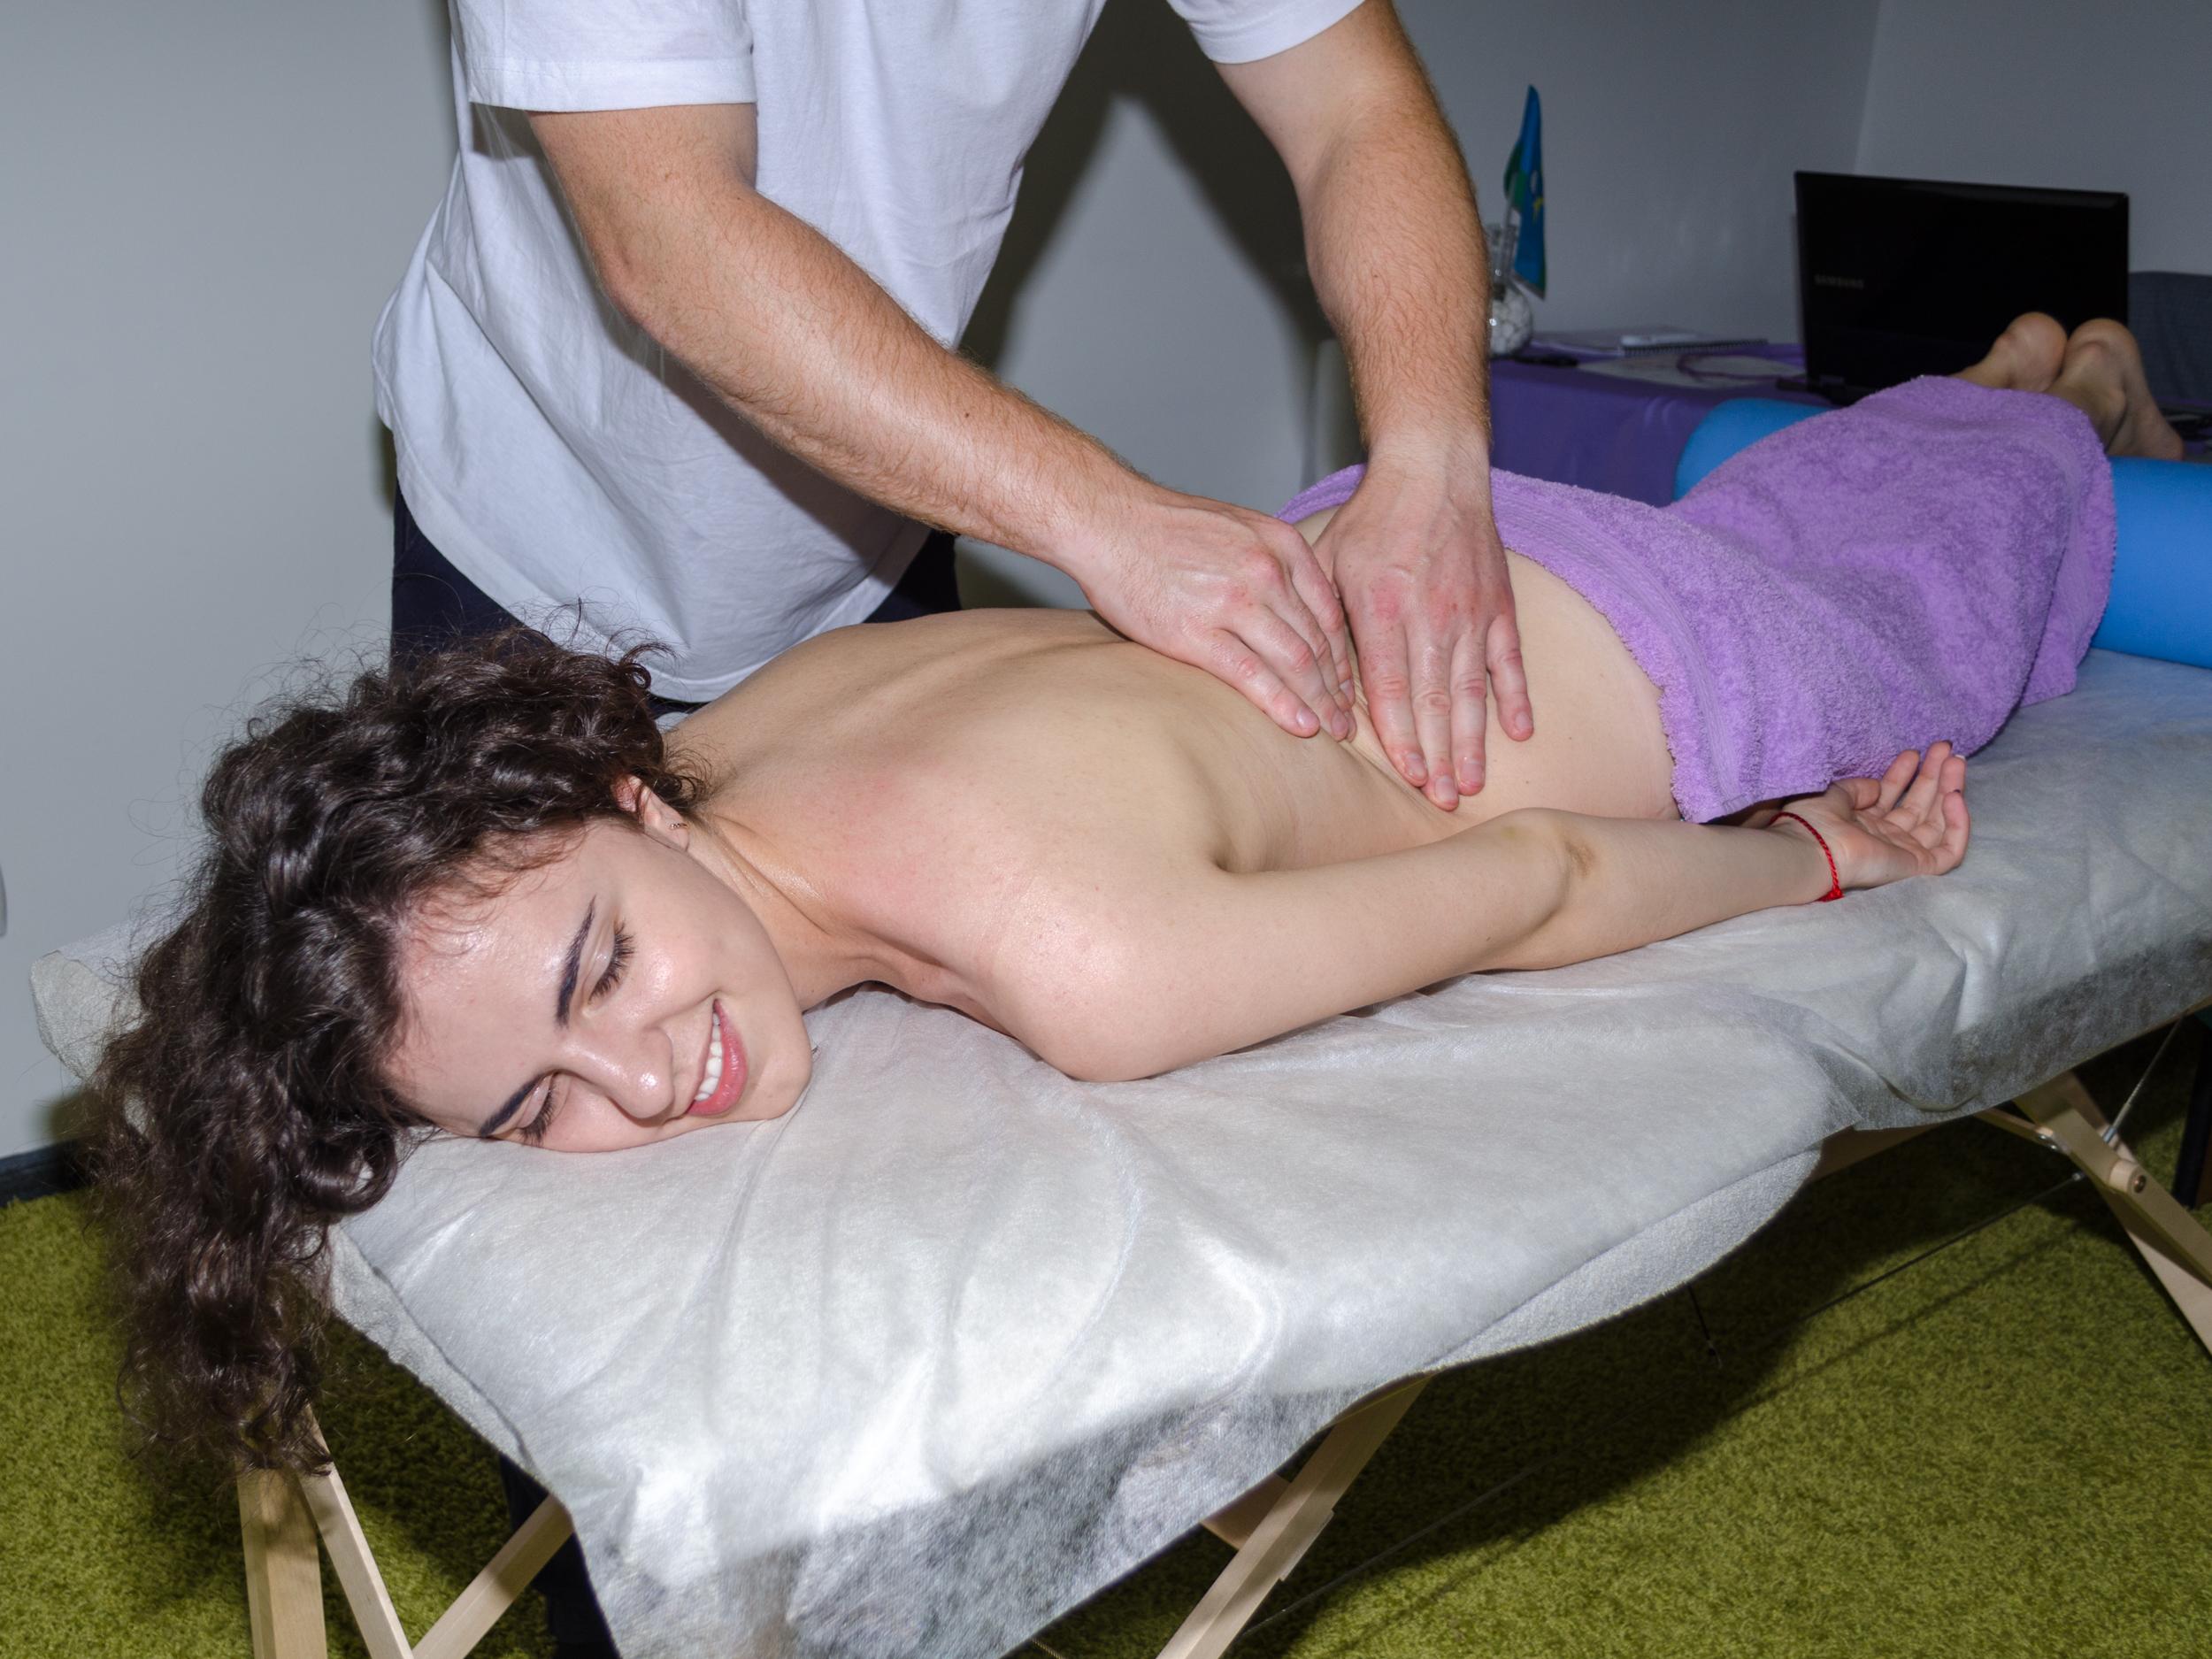 Фото кіборг масаж 1